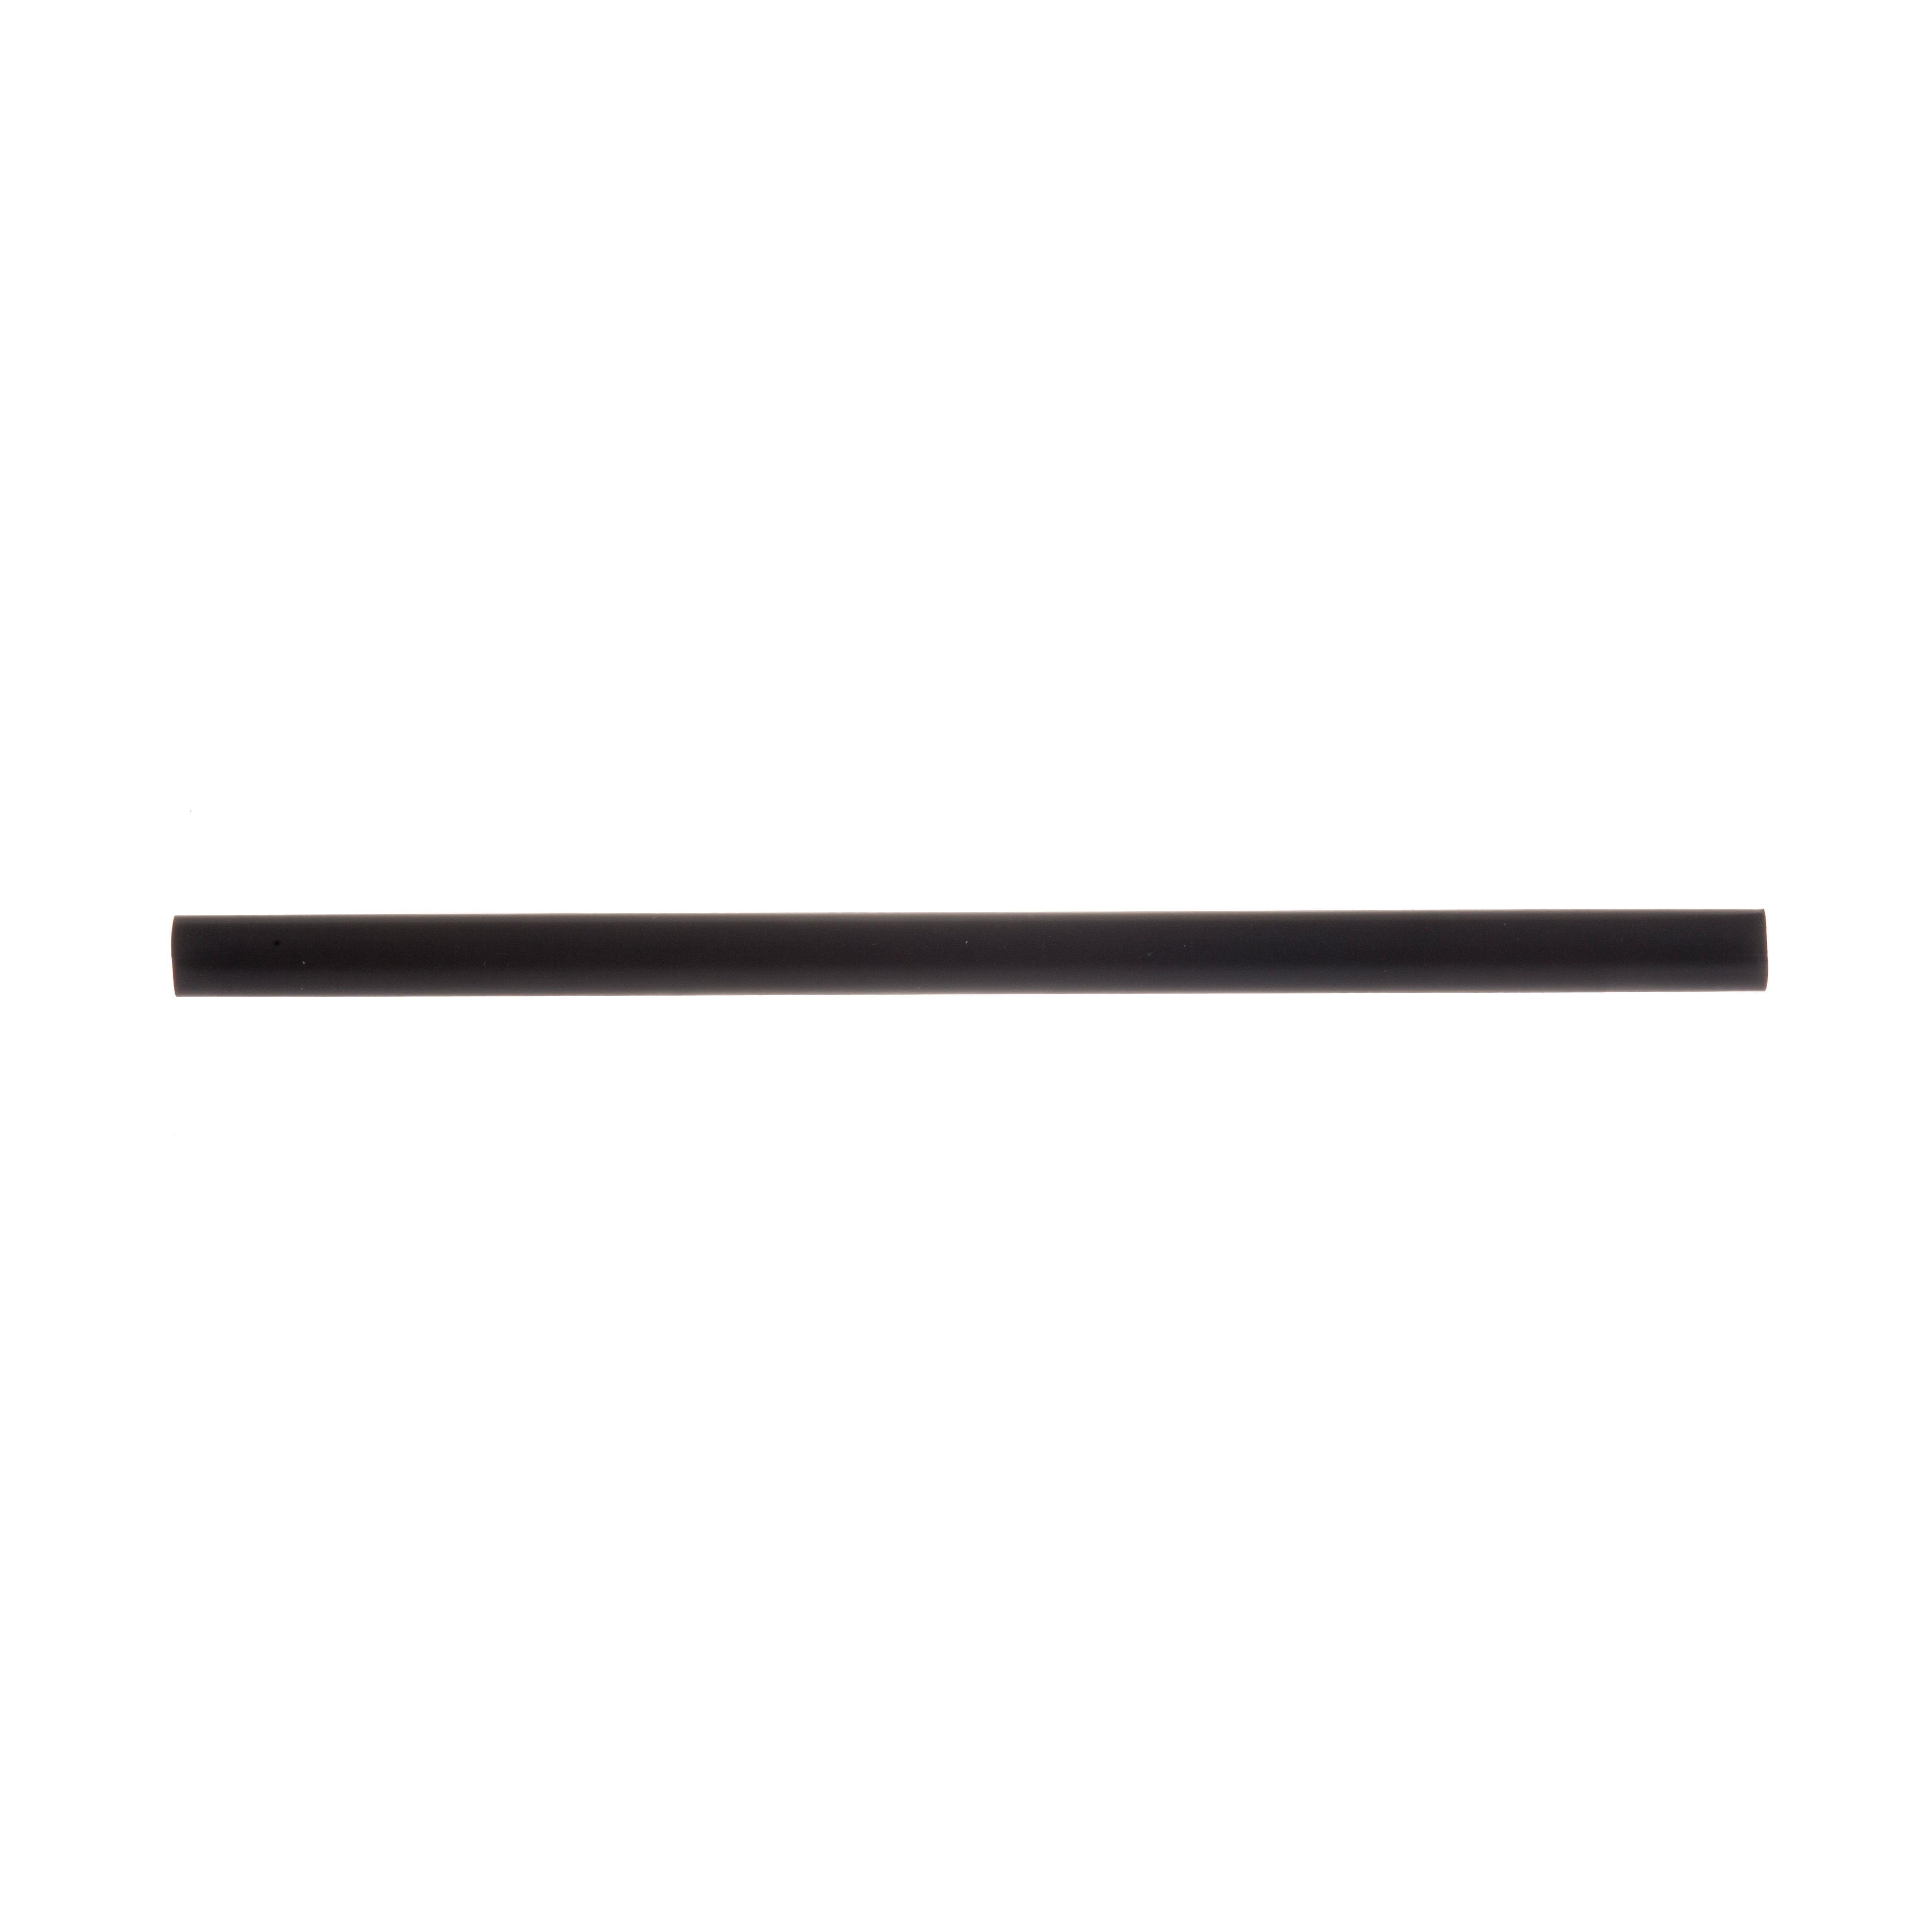 TableCraft Products 100109 straws